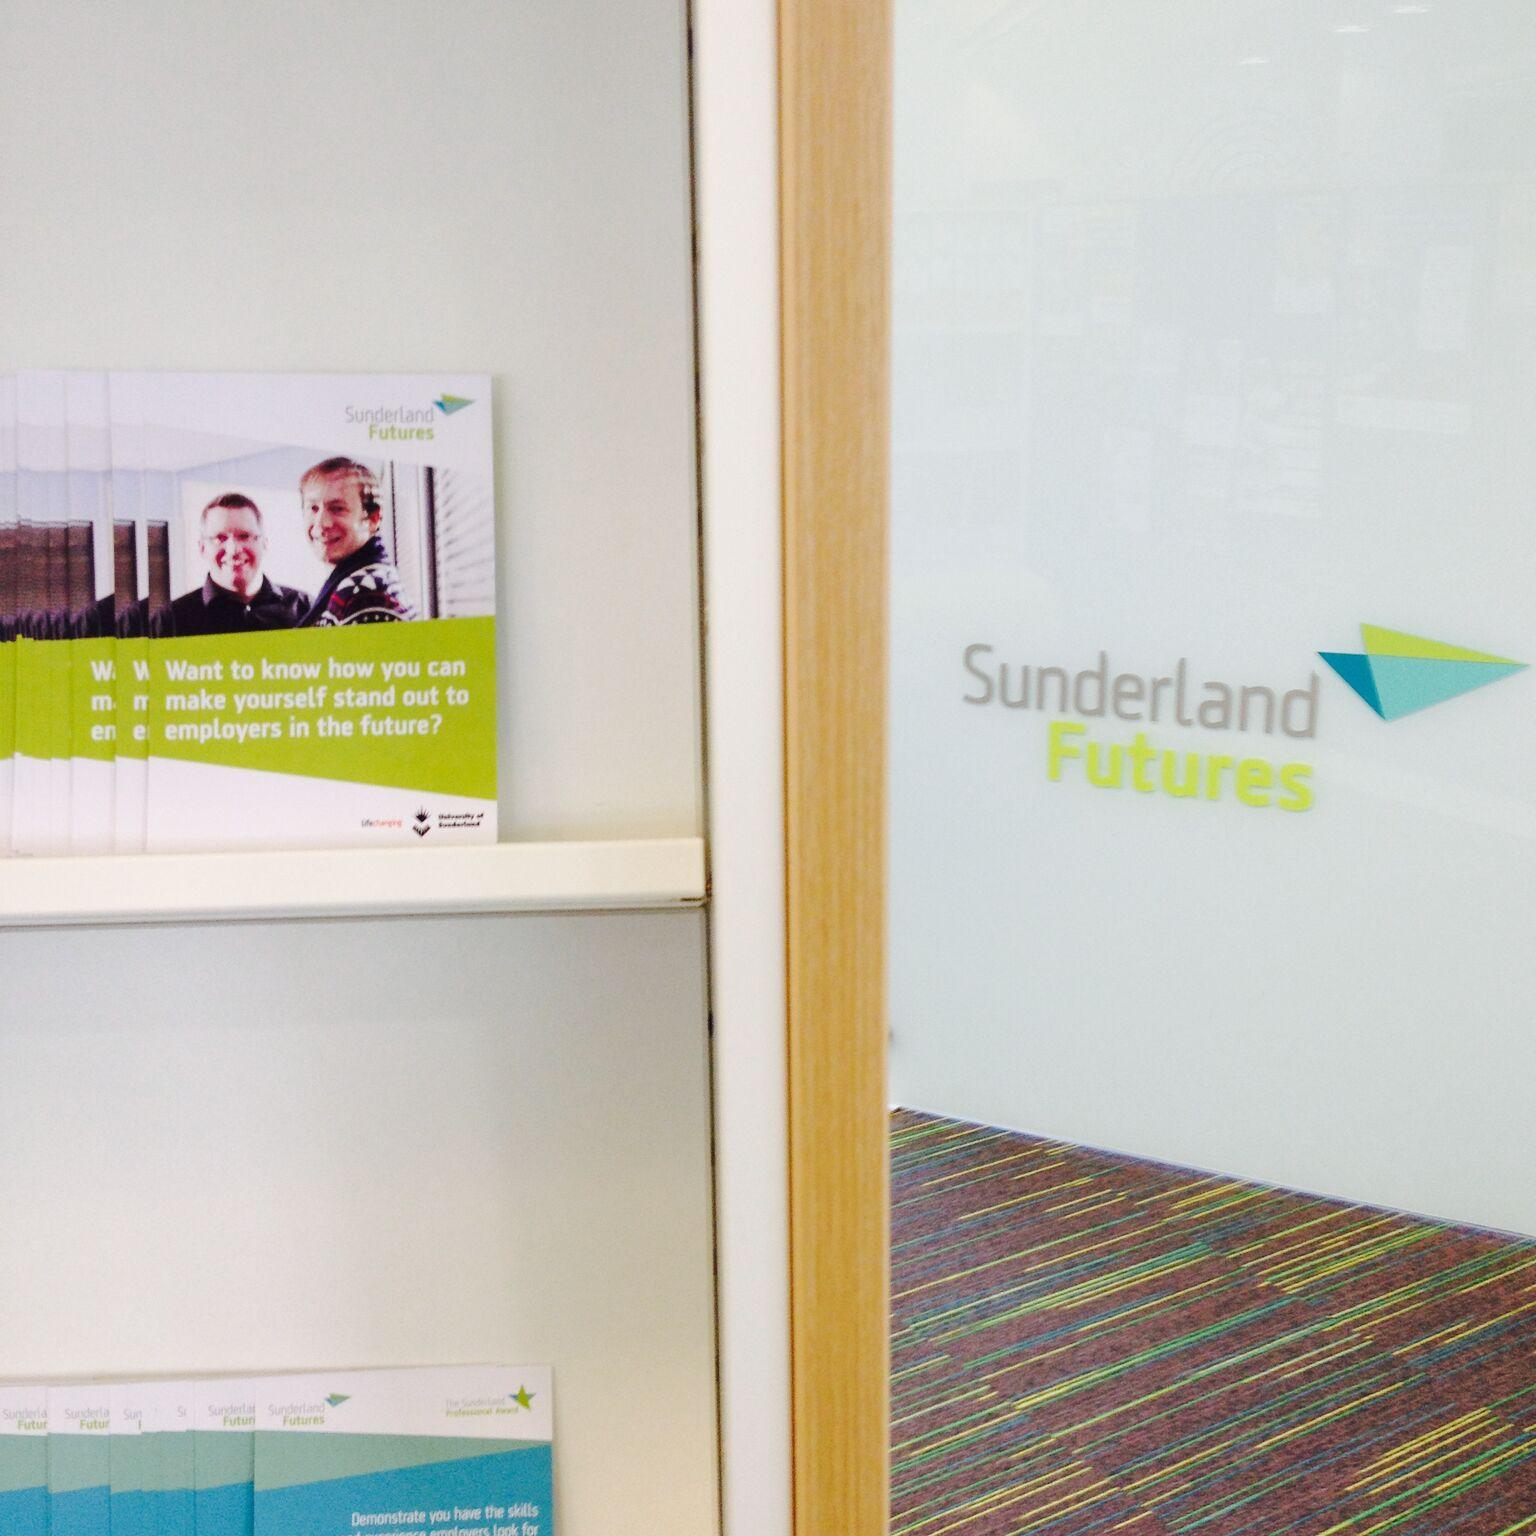 New branding Sunderland Futures